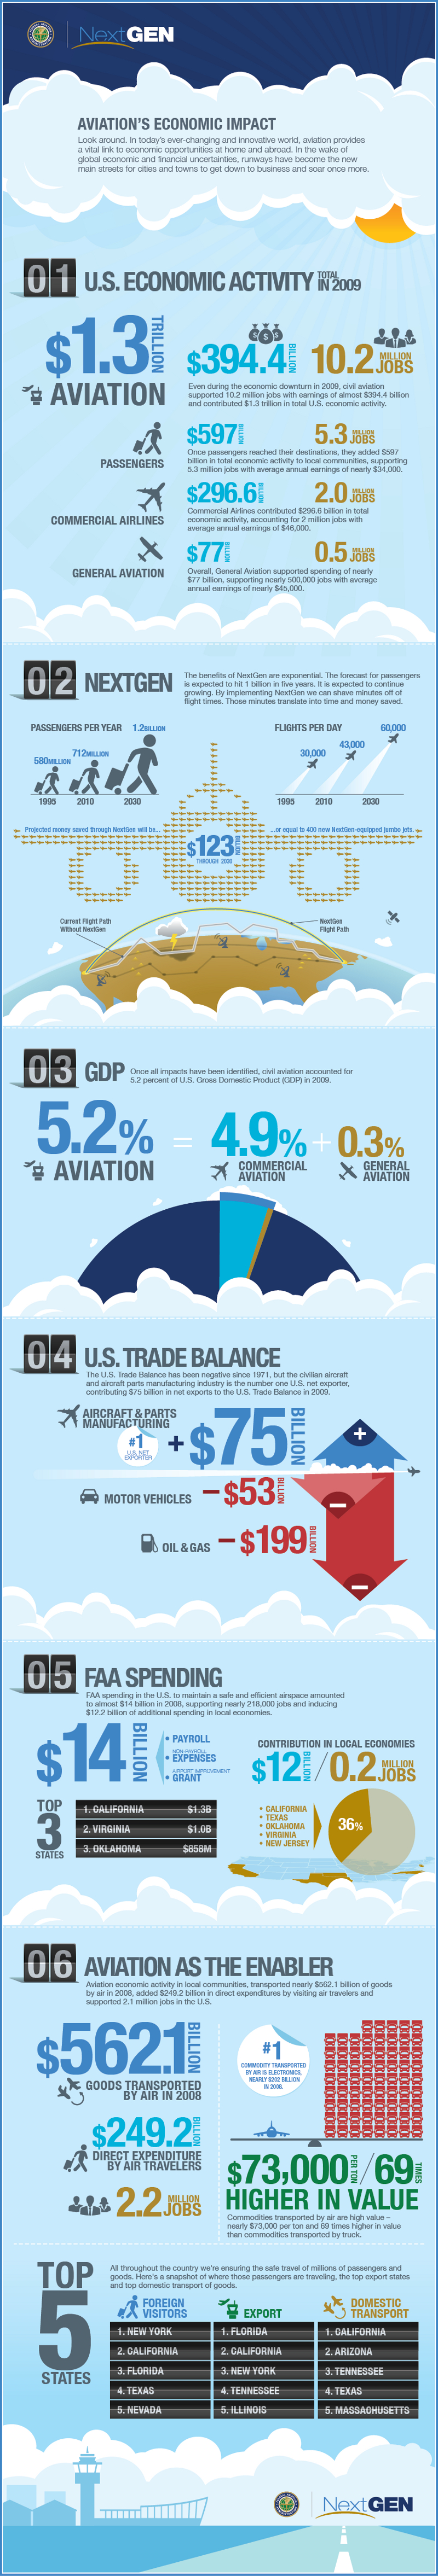 Economic Impact on Aviation Industry